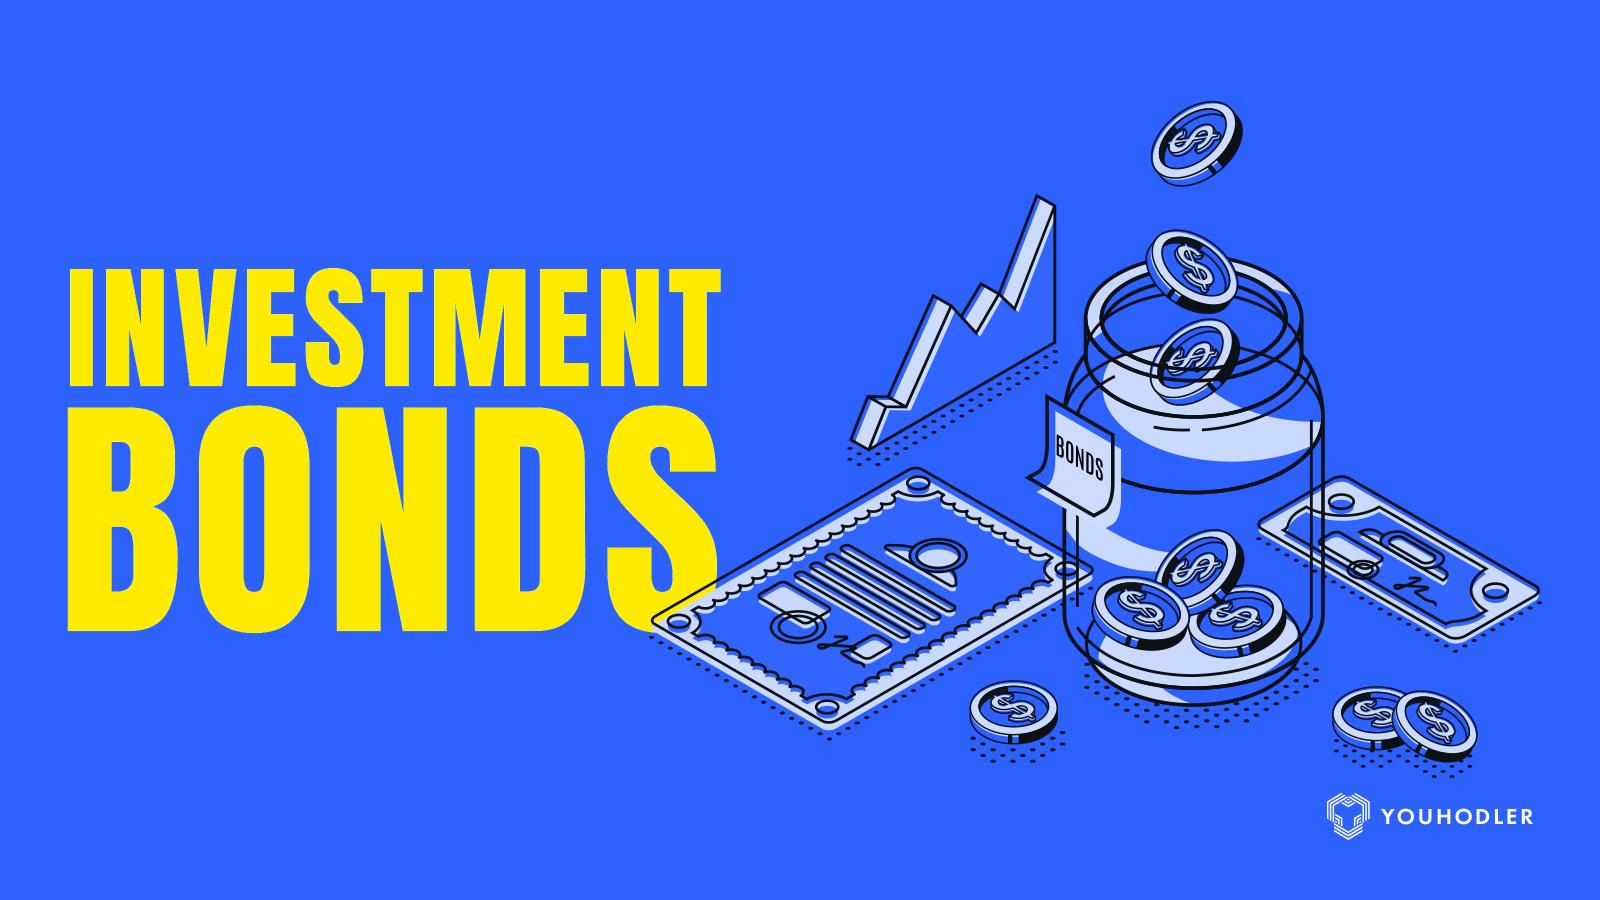 investment bonds, crypto, bitcoin, defi